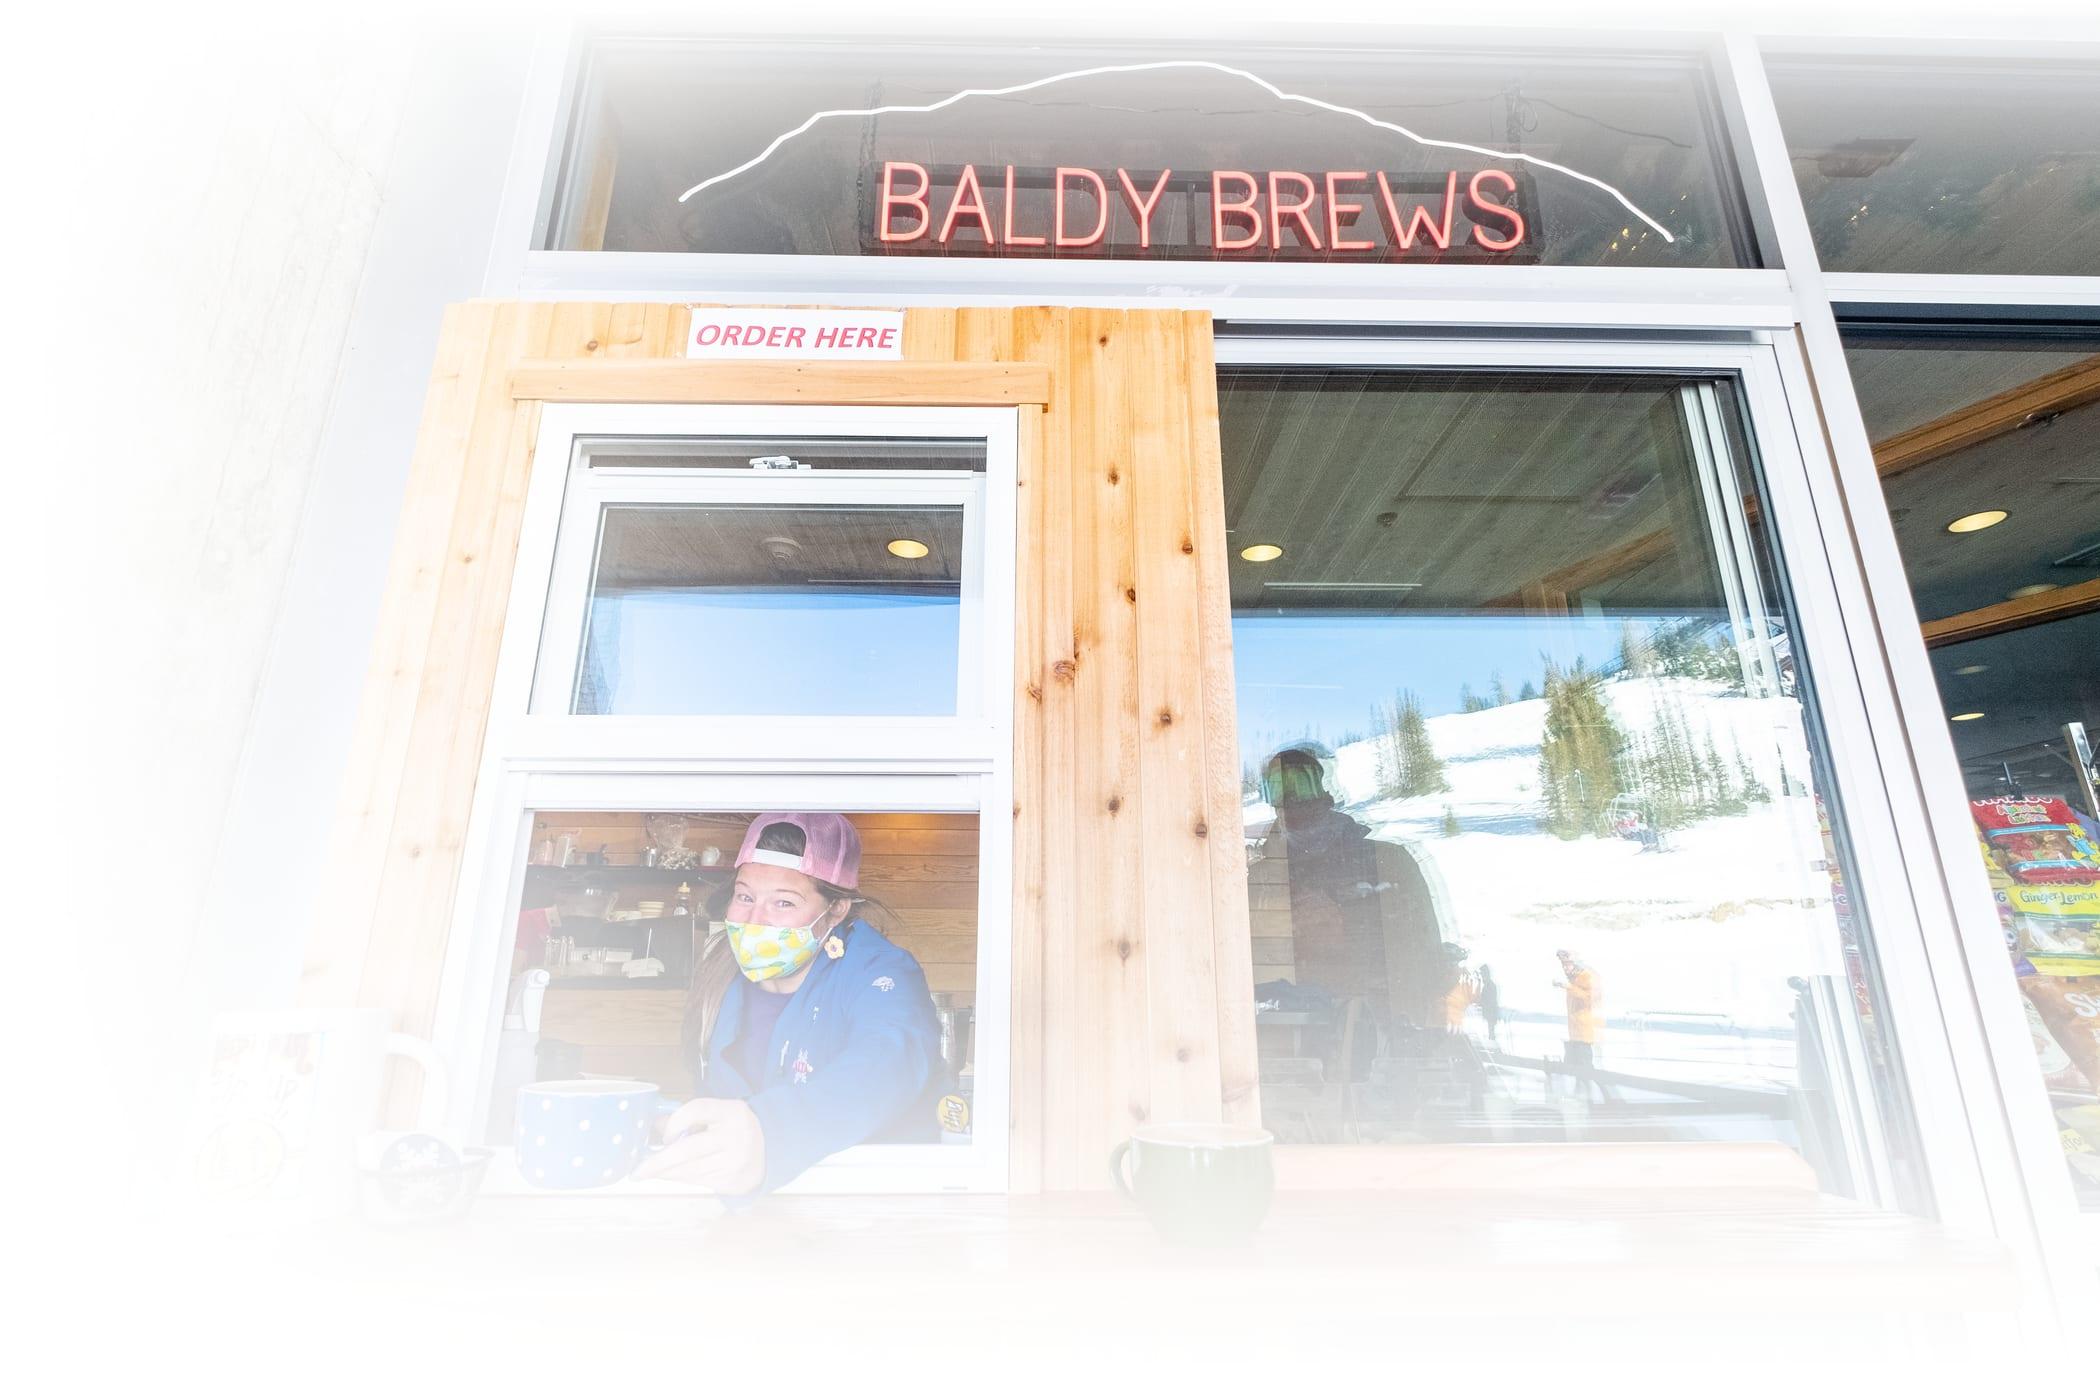 A Baldy Brews eployee serves a coffee through the new takeout window